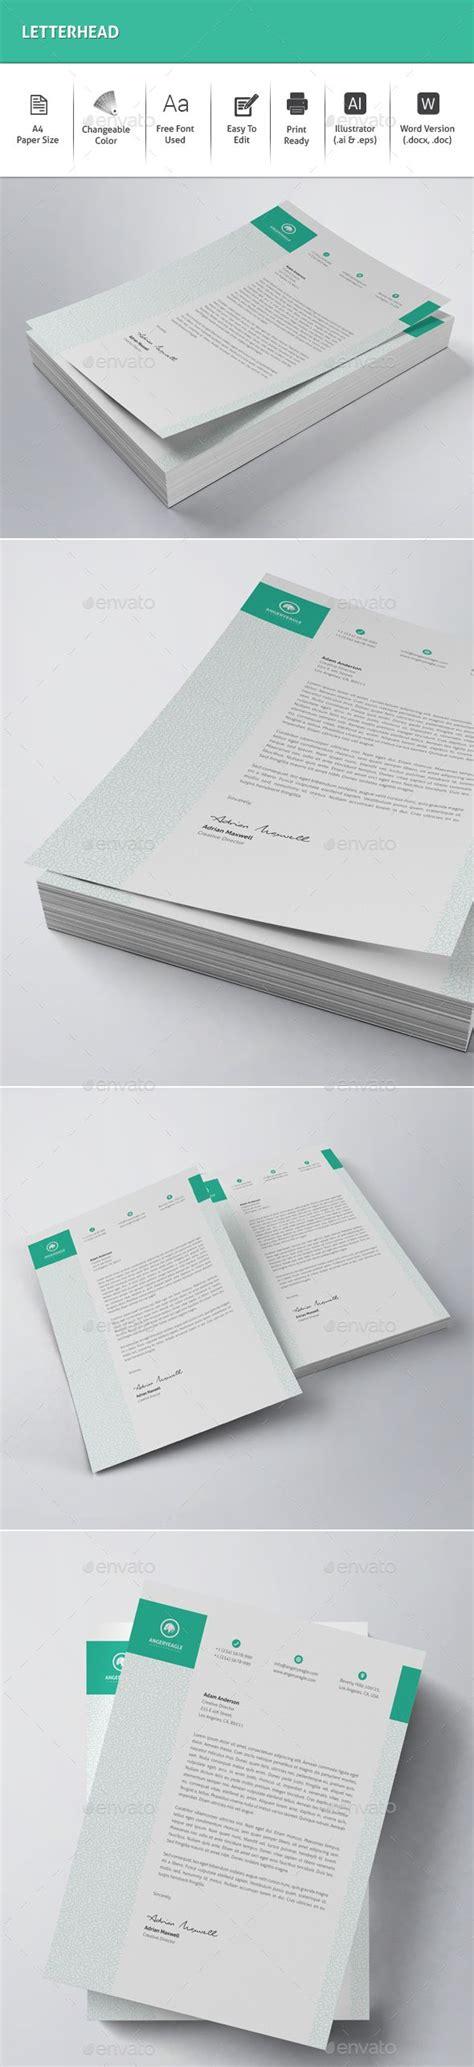 letterhead design template ms word vector eps ai